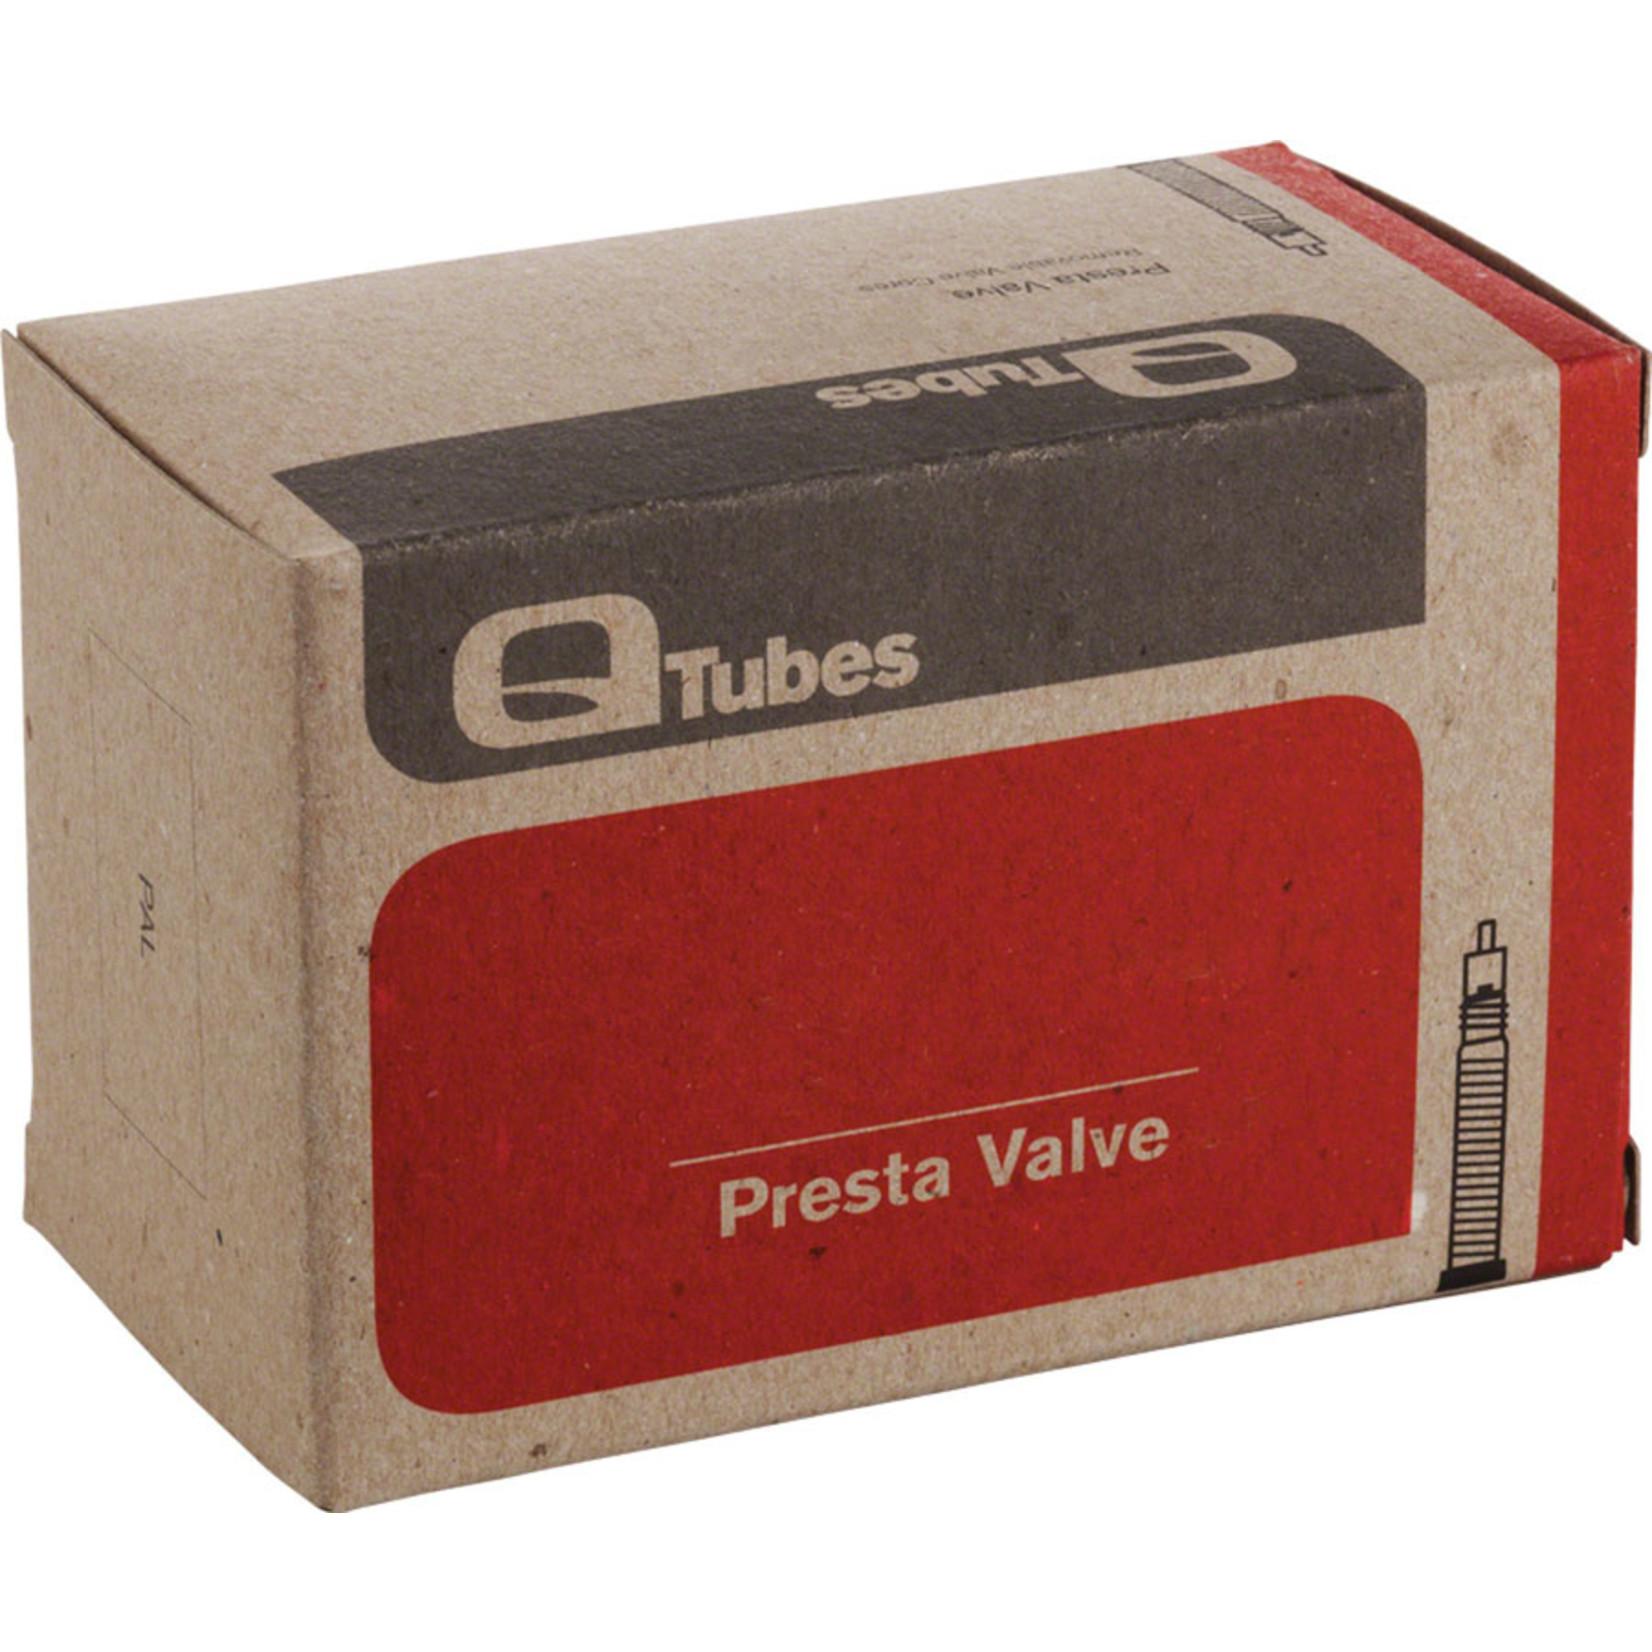 Q-Tubes Q-Tubes Superlight 700c x 23-25mm 48mm Presta Valve Tube